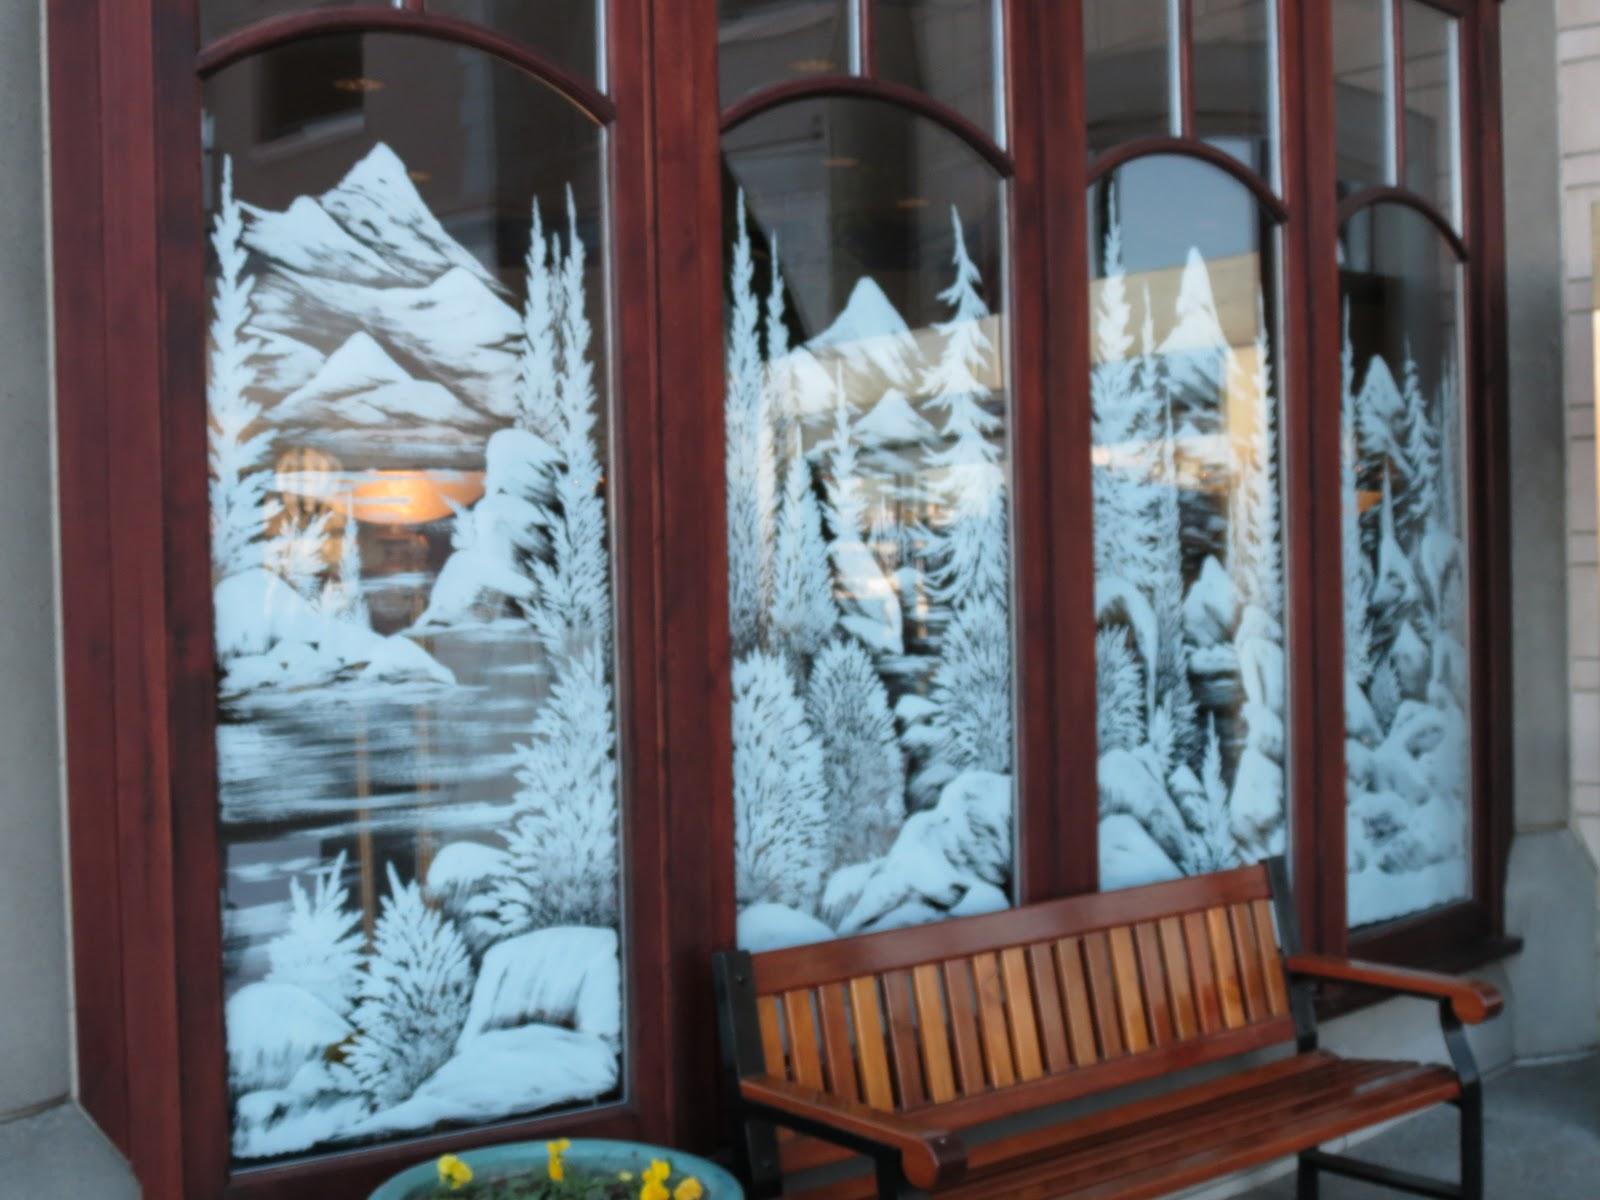 Destination Mike: Christmas Window Paintings